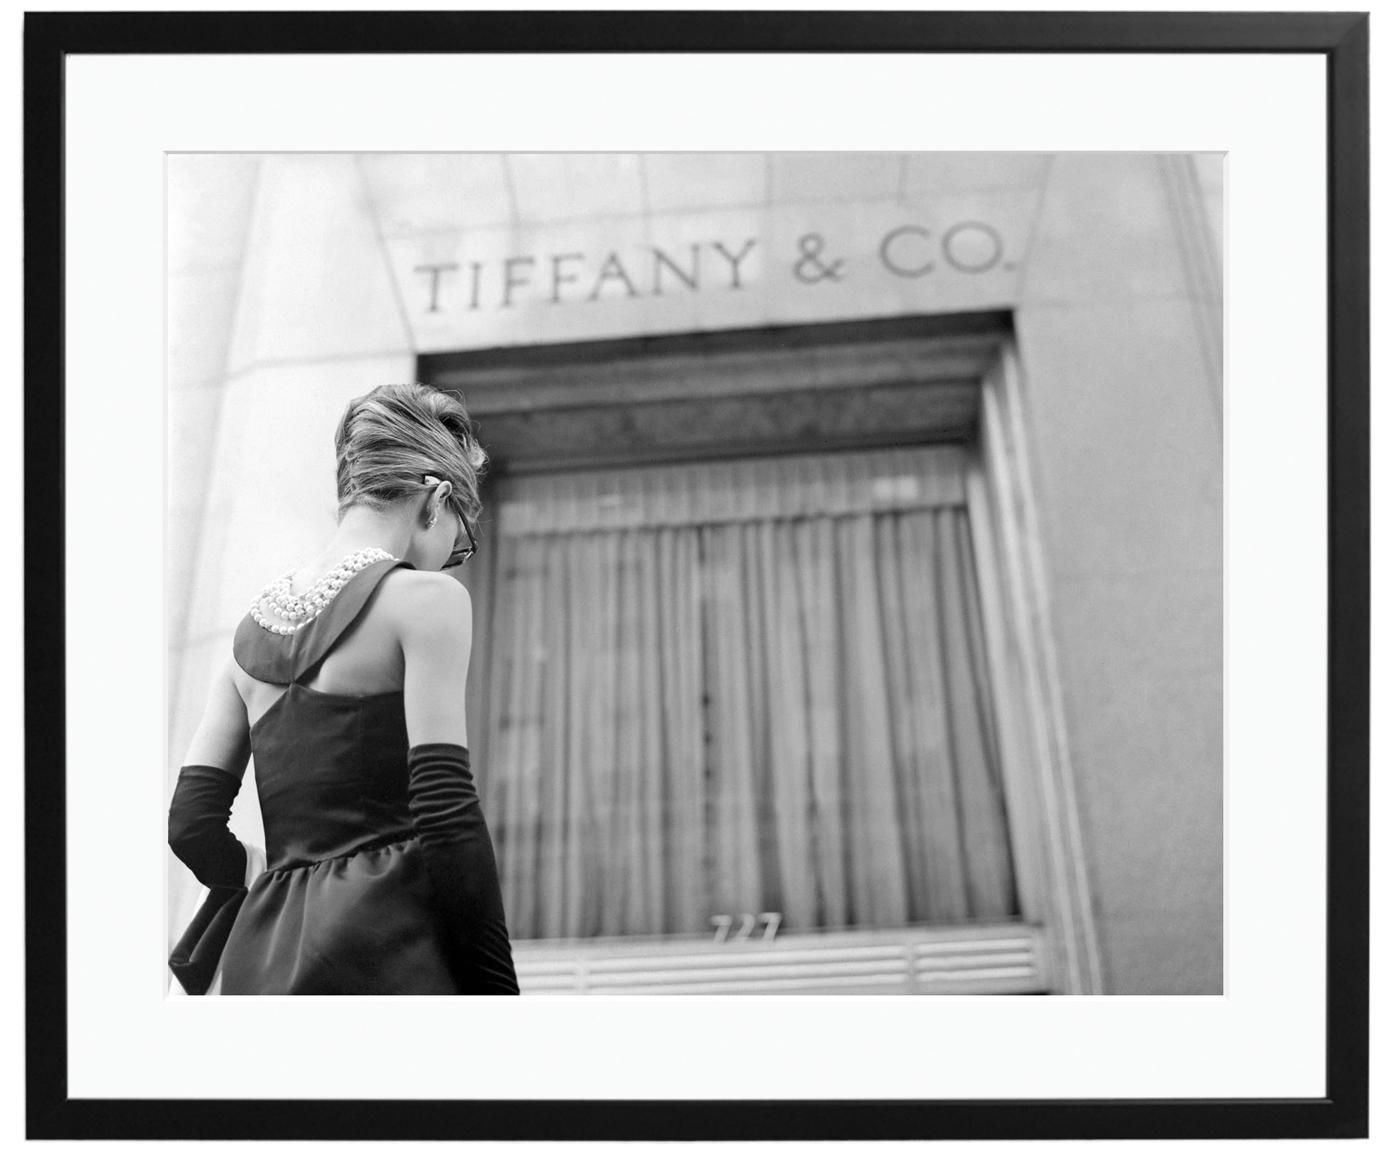 Ingelijste fotoprint Hepburn Breakfast at Tiffany's, Afbeelding: Fuji Crystal Archive-papi, Lijst: gelakt hout, Afbeelding: zwart, wit. Frame: zwart, 50 x 40 cm